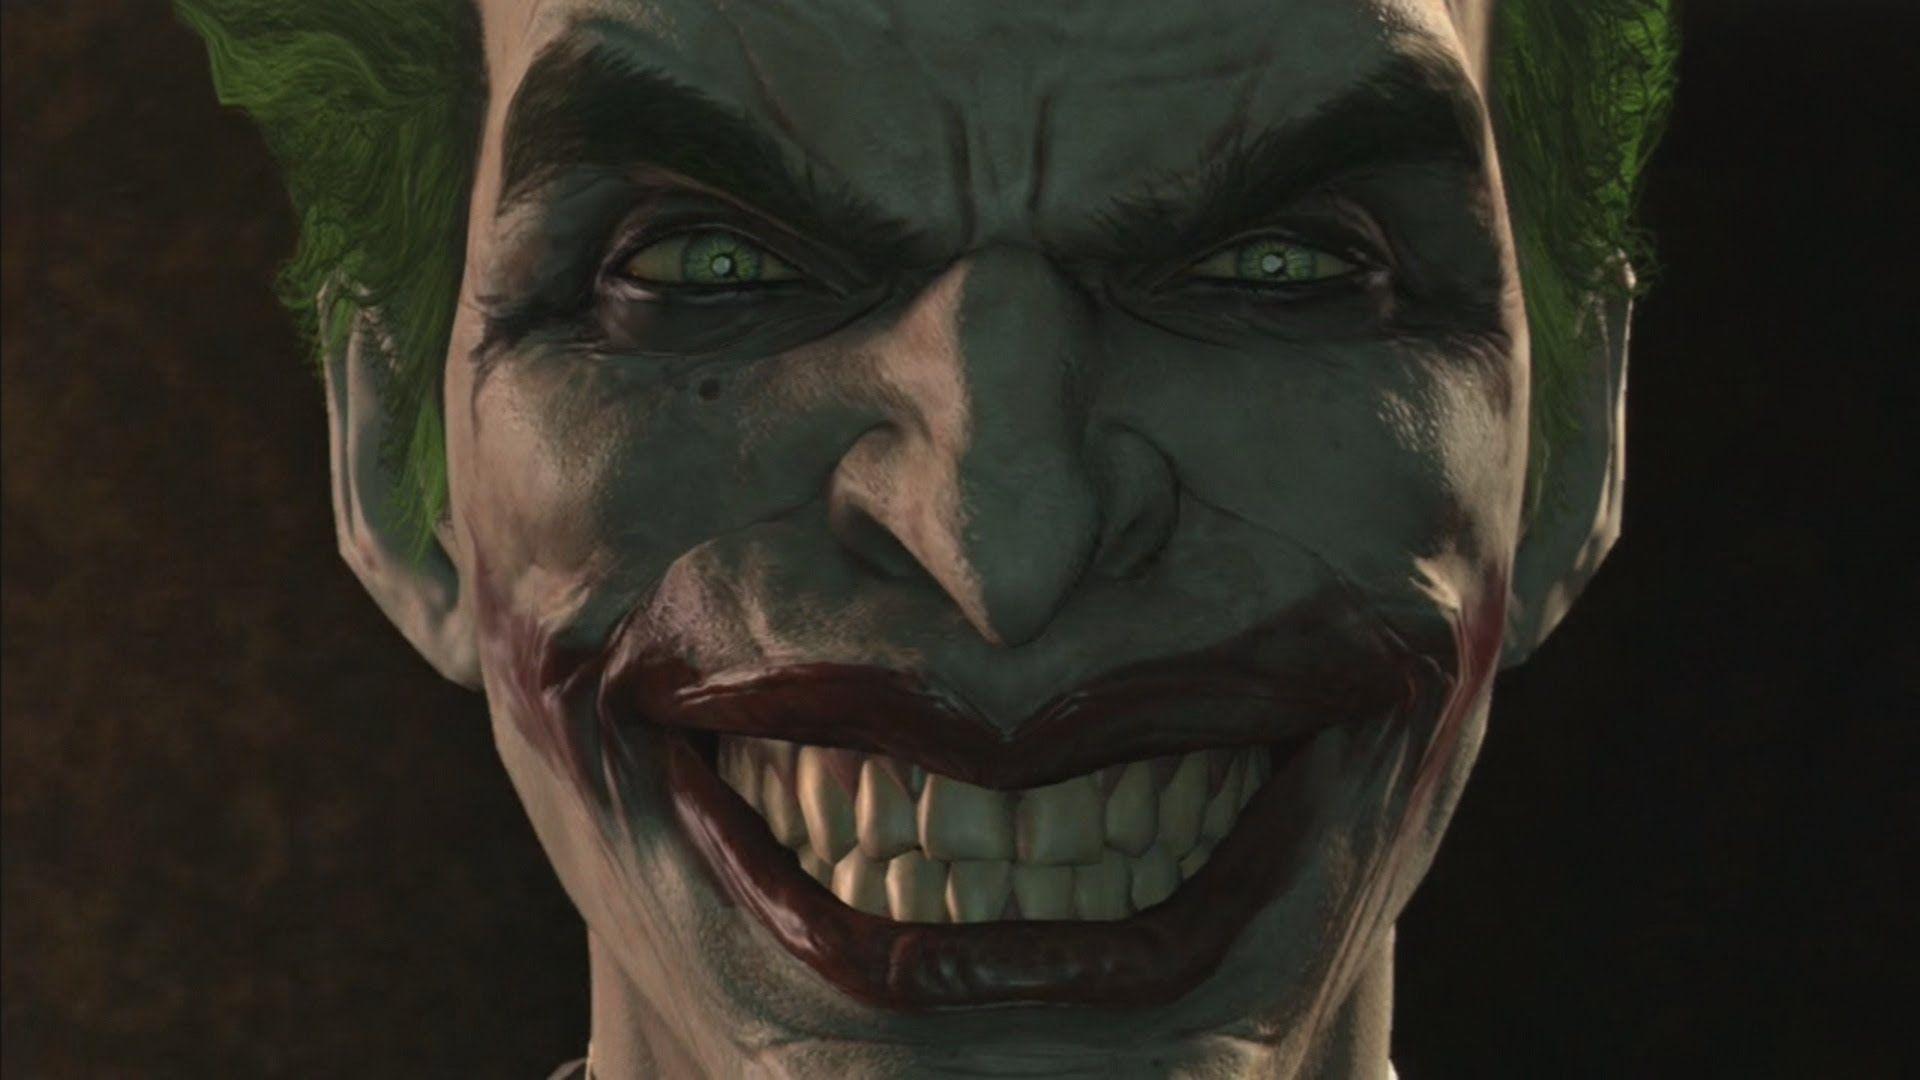 Batman arkham origins the jokers therapy session about batman batman arkham origins the jokers therapy session about batman with har voltagebd Gallery